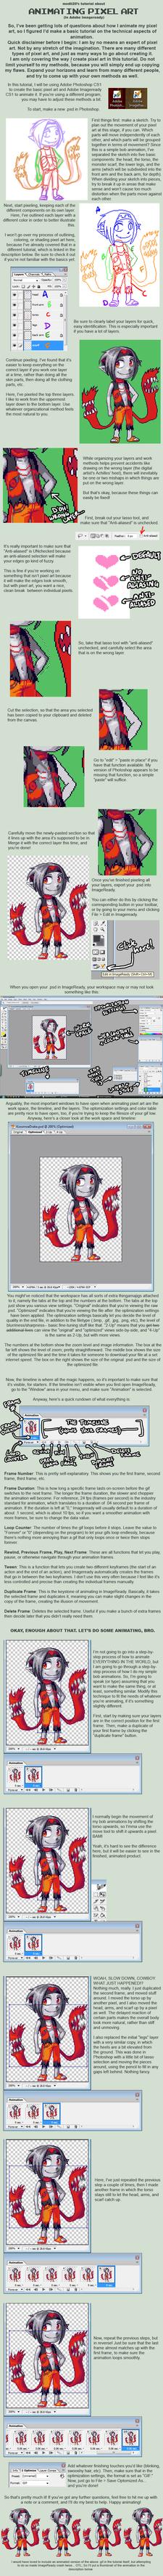 Pixel art tutorial: Animation by medli20